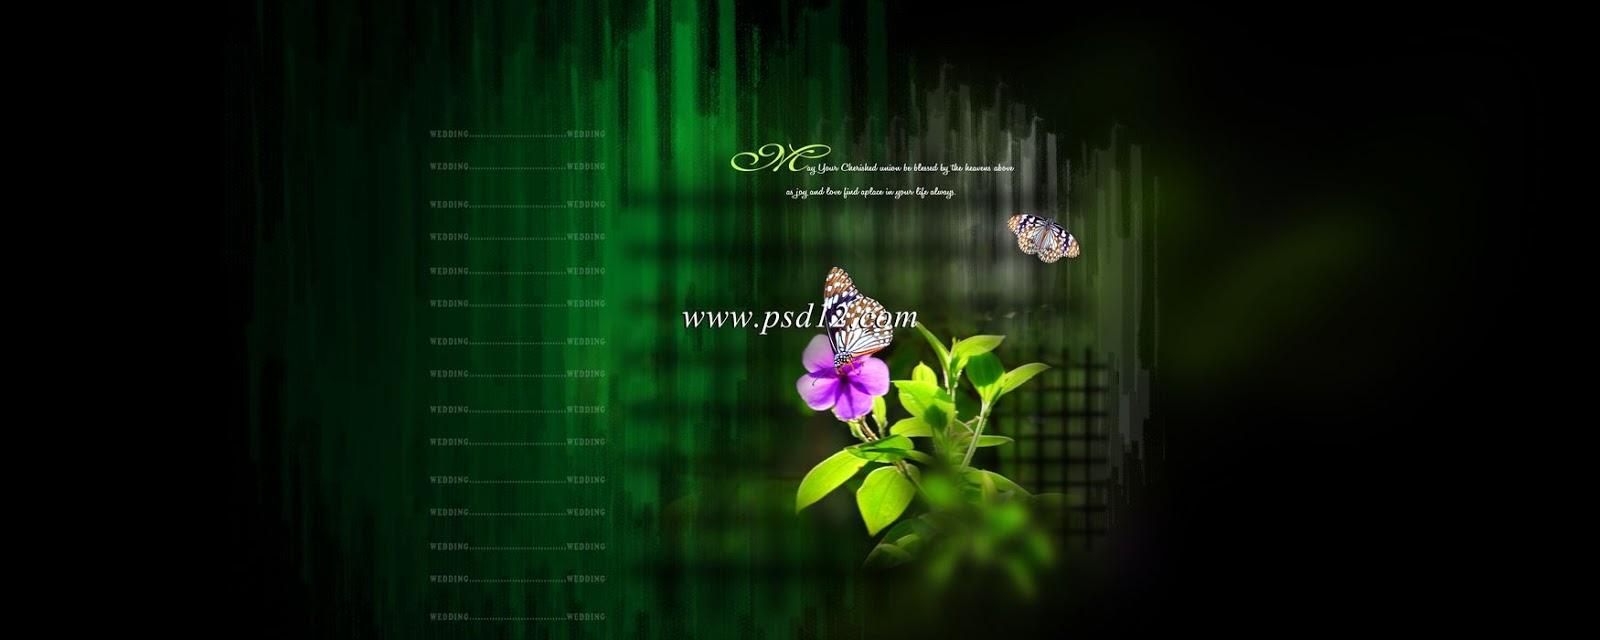 12x30 PSD Karizma Album Backgrounds